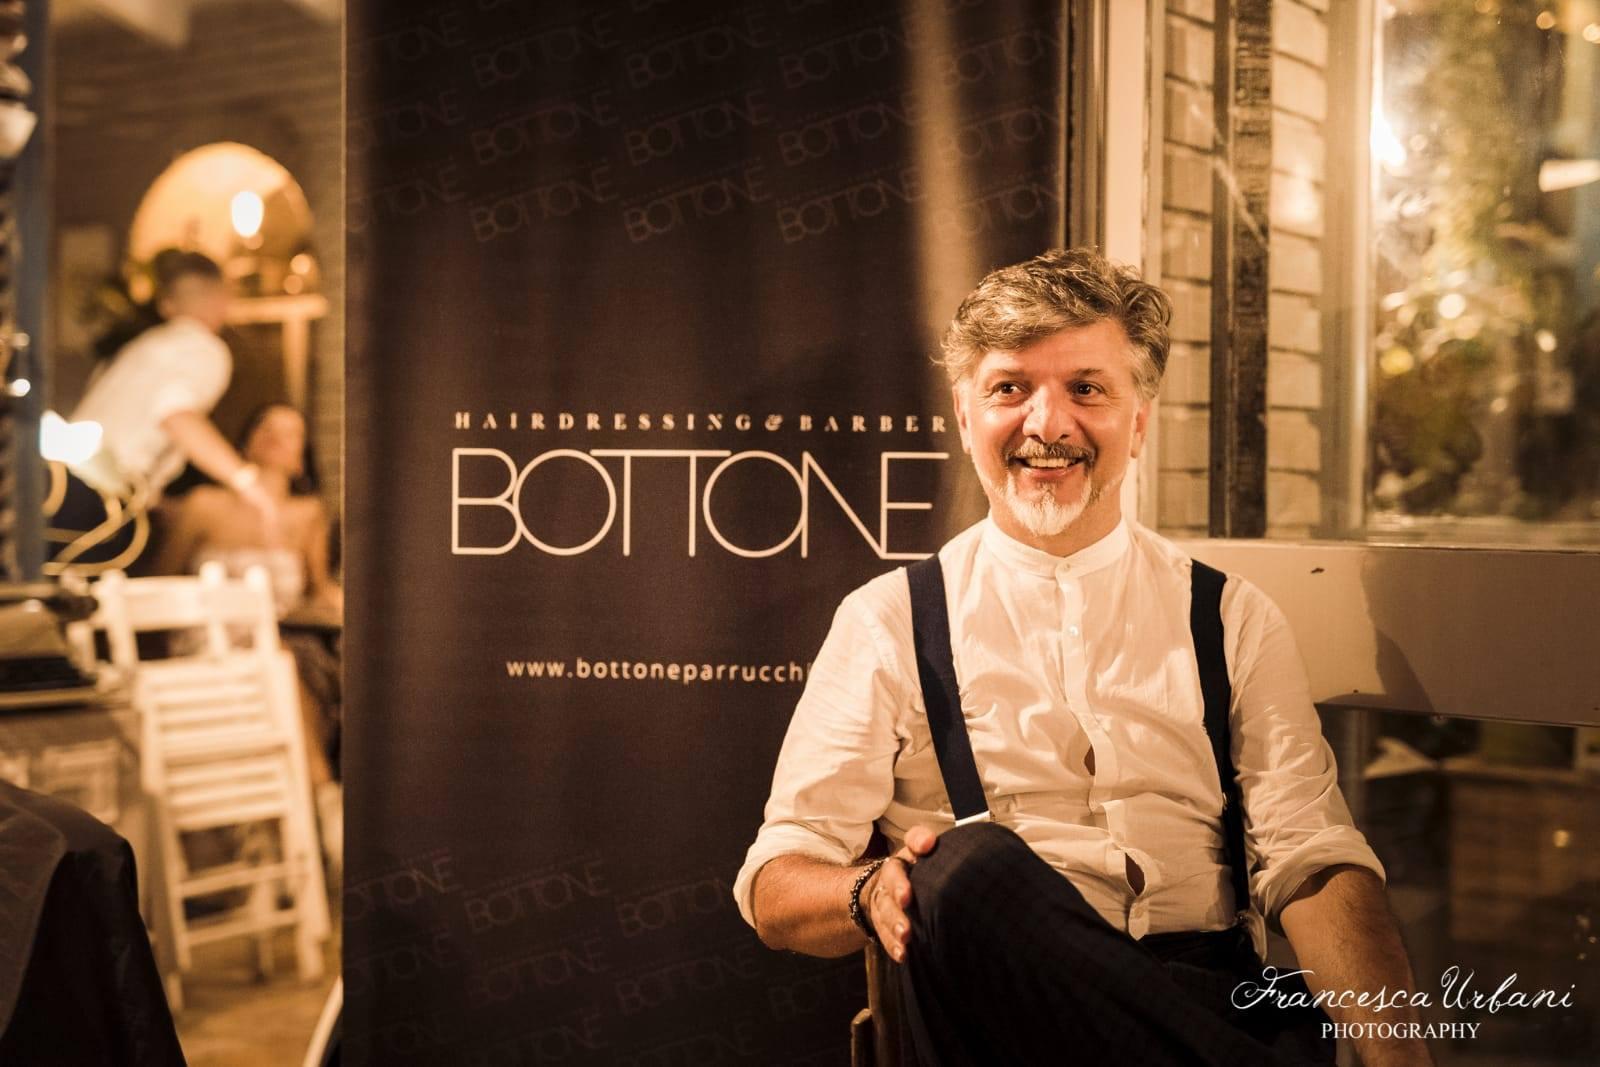 Immagine 3 BOTTONE Hairdressing & Barber